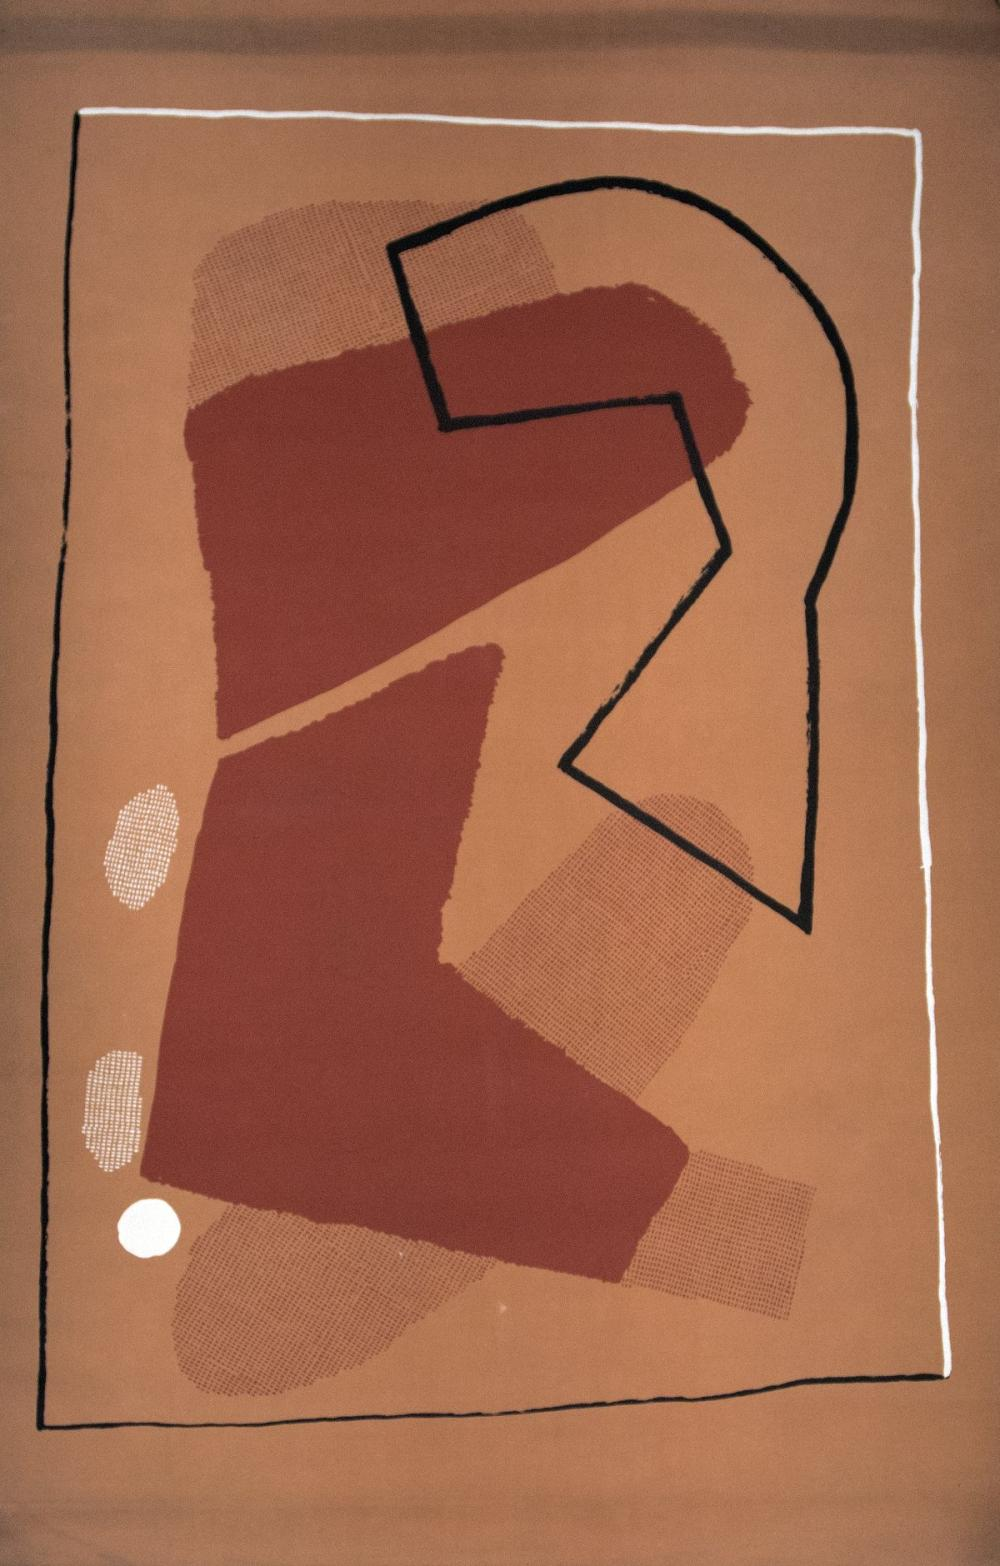 Burchartz, Max: Abstrakte Komposition